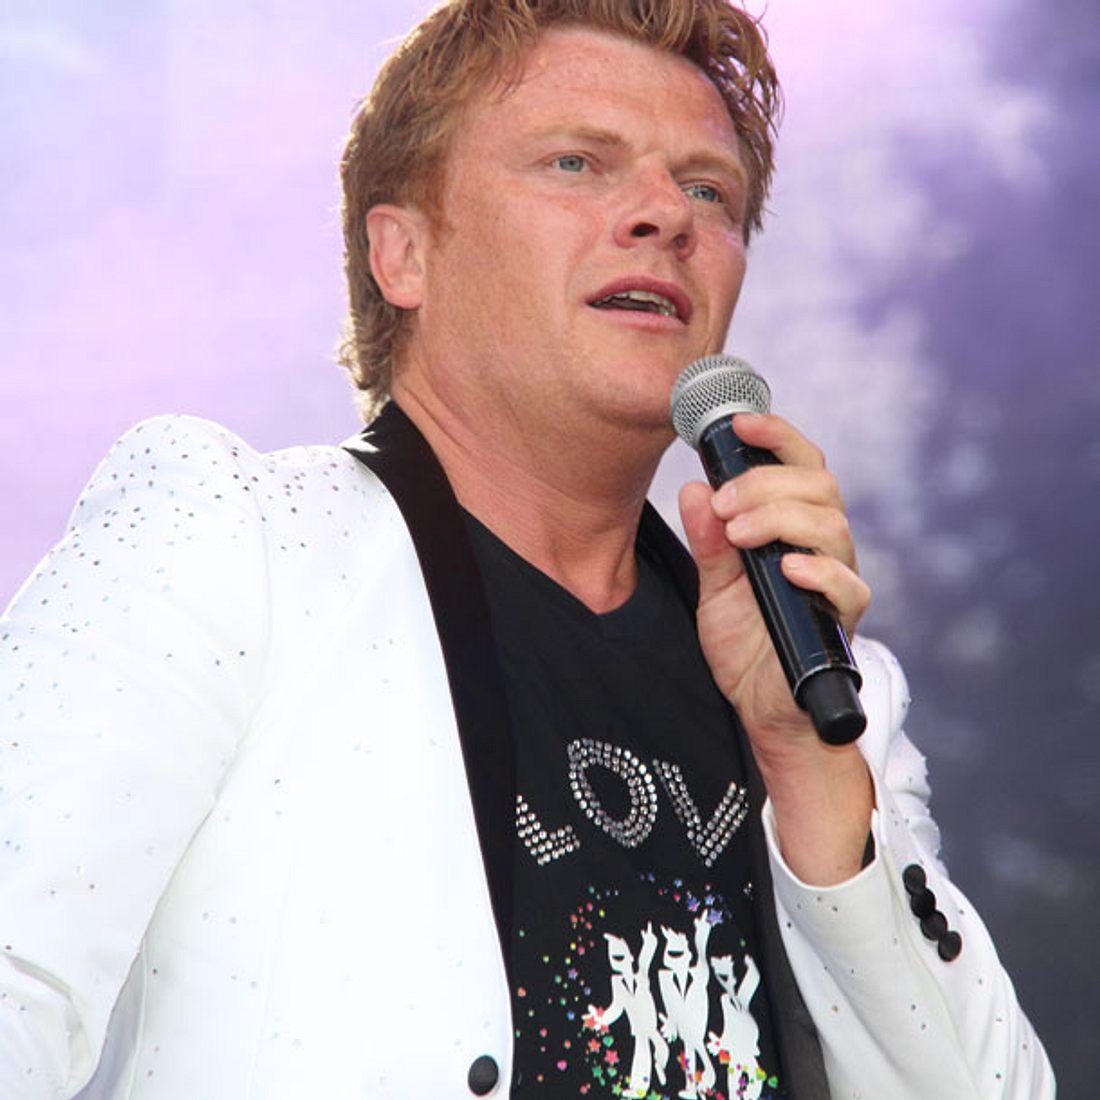 Let's Dance: Große Sorge um Bastiaan Ragas